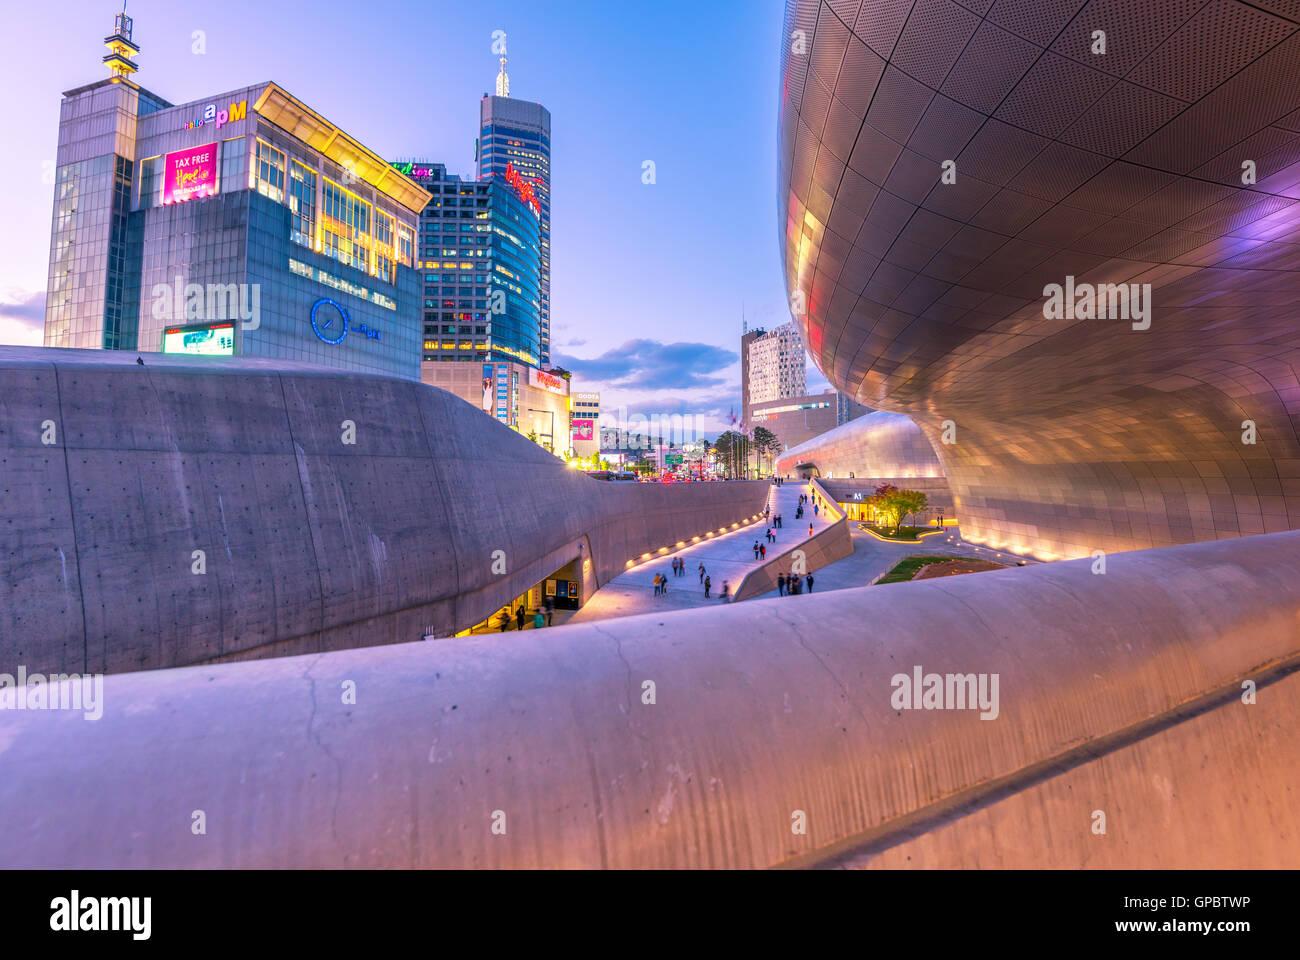 Dongdaemun Design Plaza,in seoul korea. - Stock Image